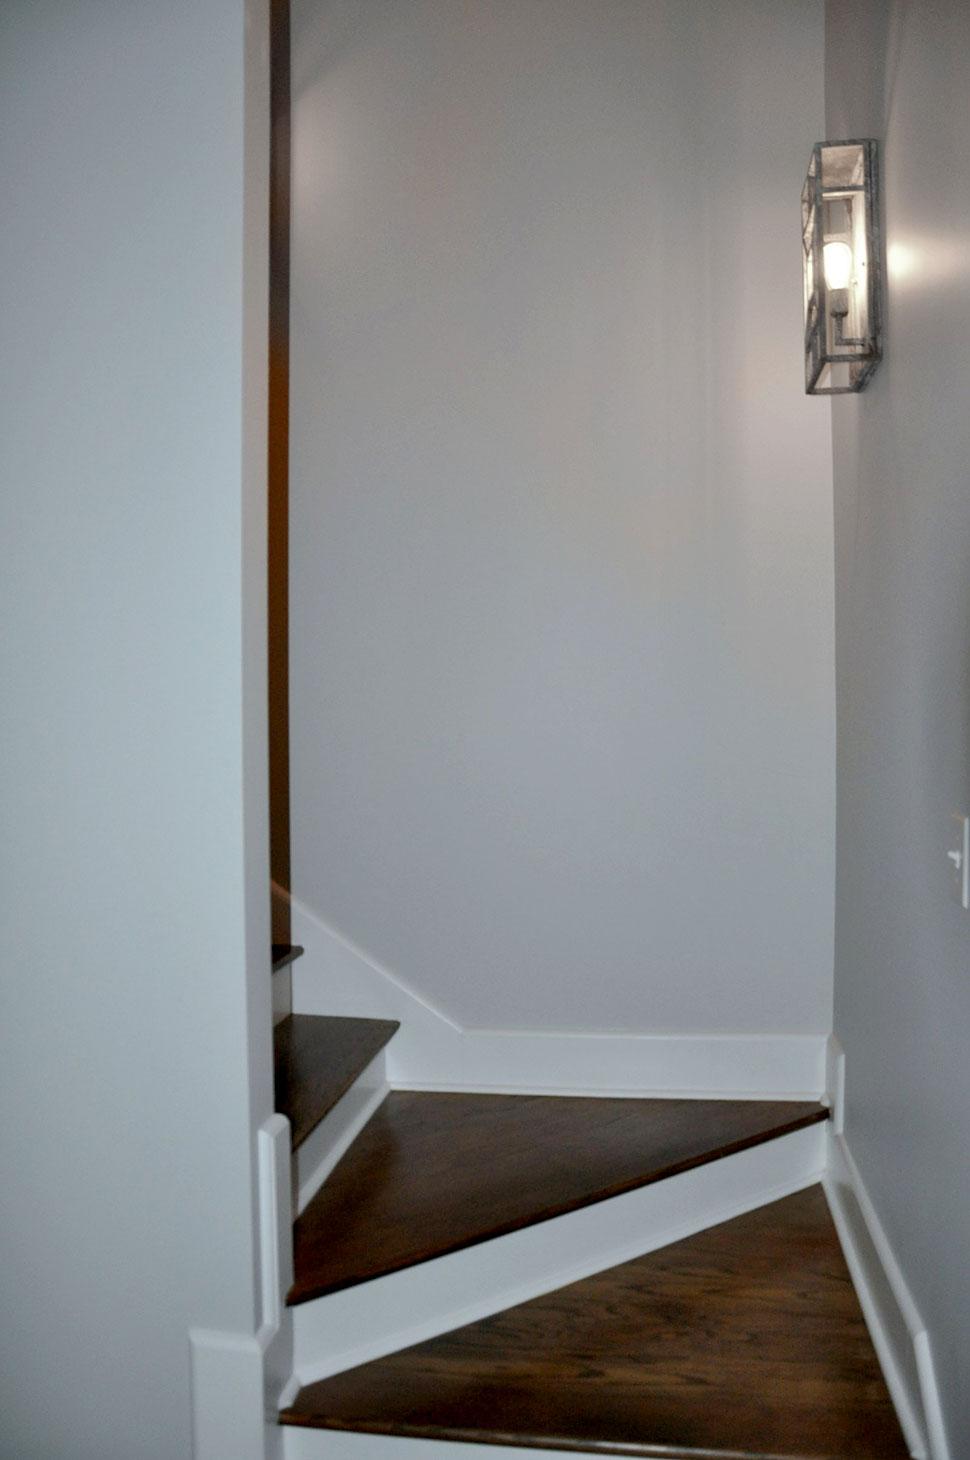 Bungalow, Cottage, Craftsman, European, Tudor House Plan 78516 with 3 Beds, 3 Baths, 2 Car Garage Picture 30